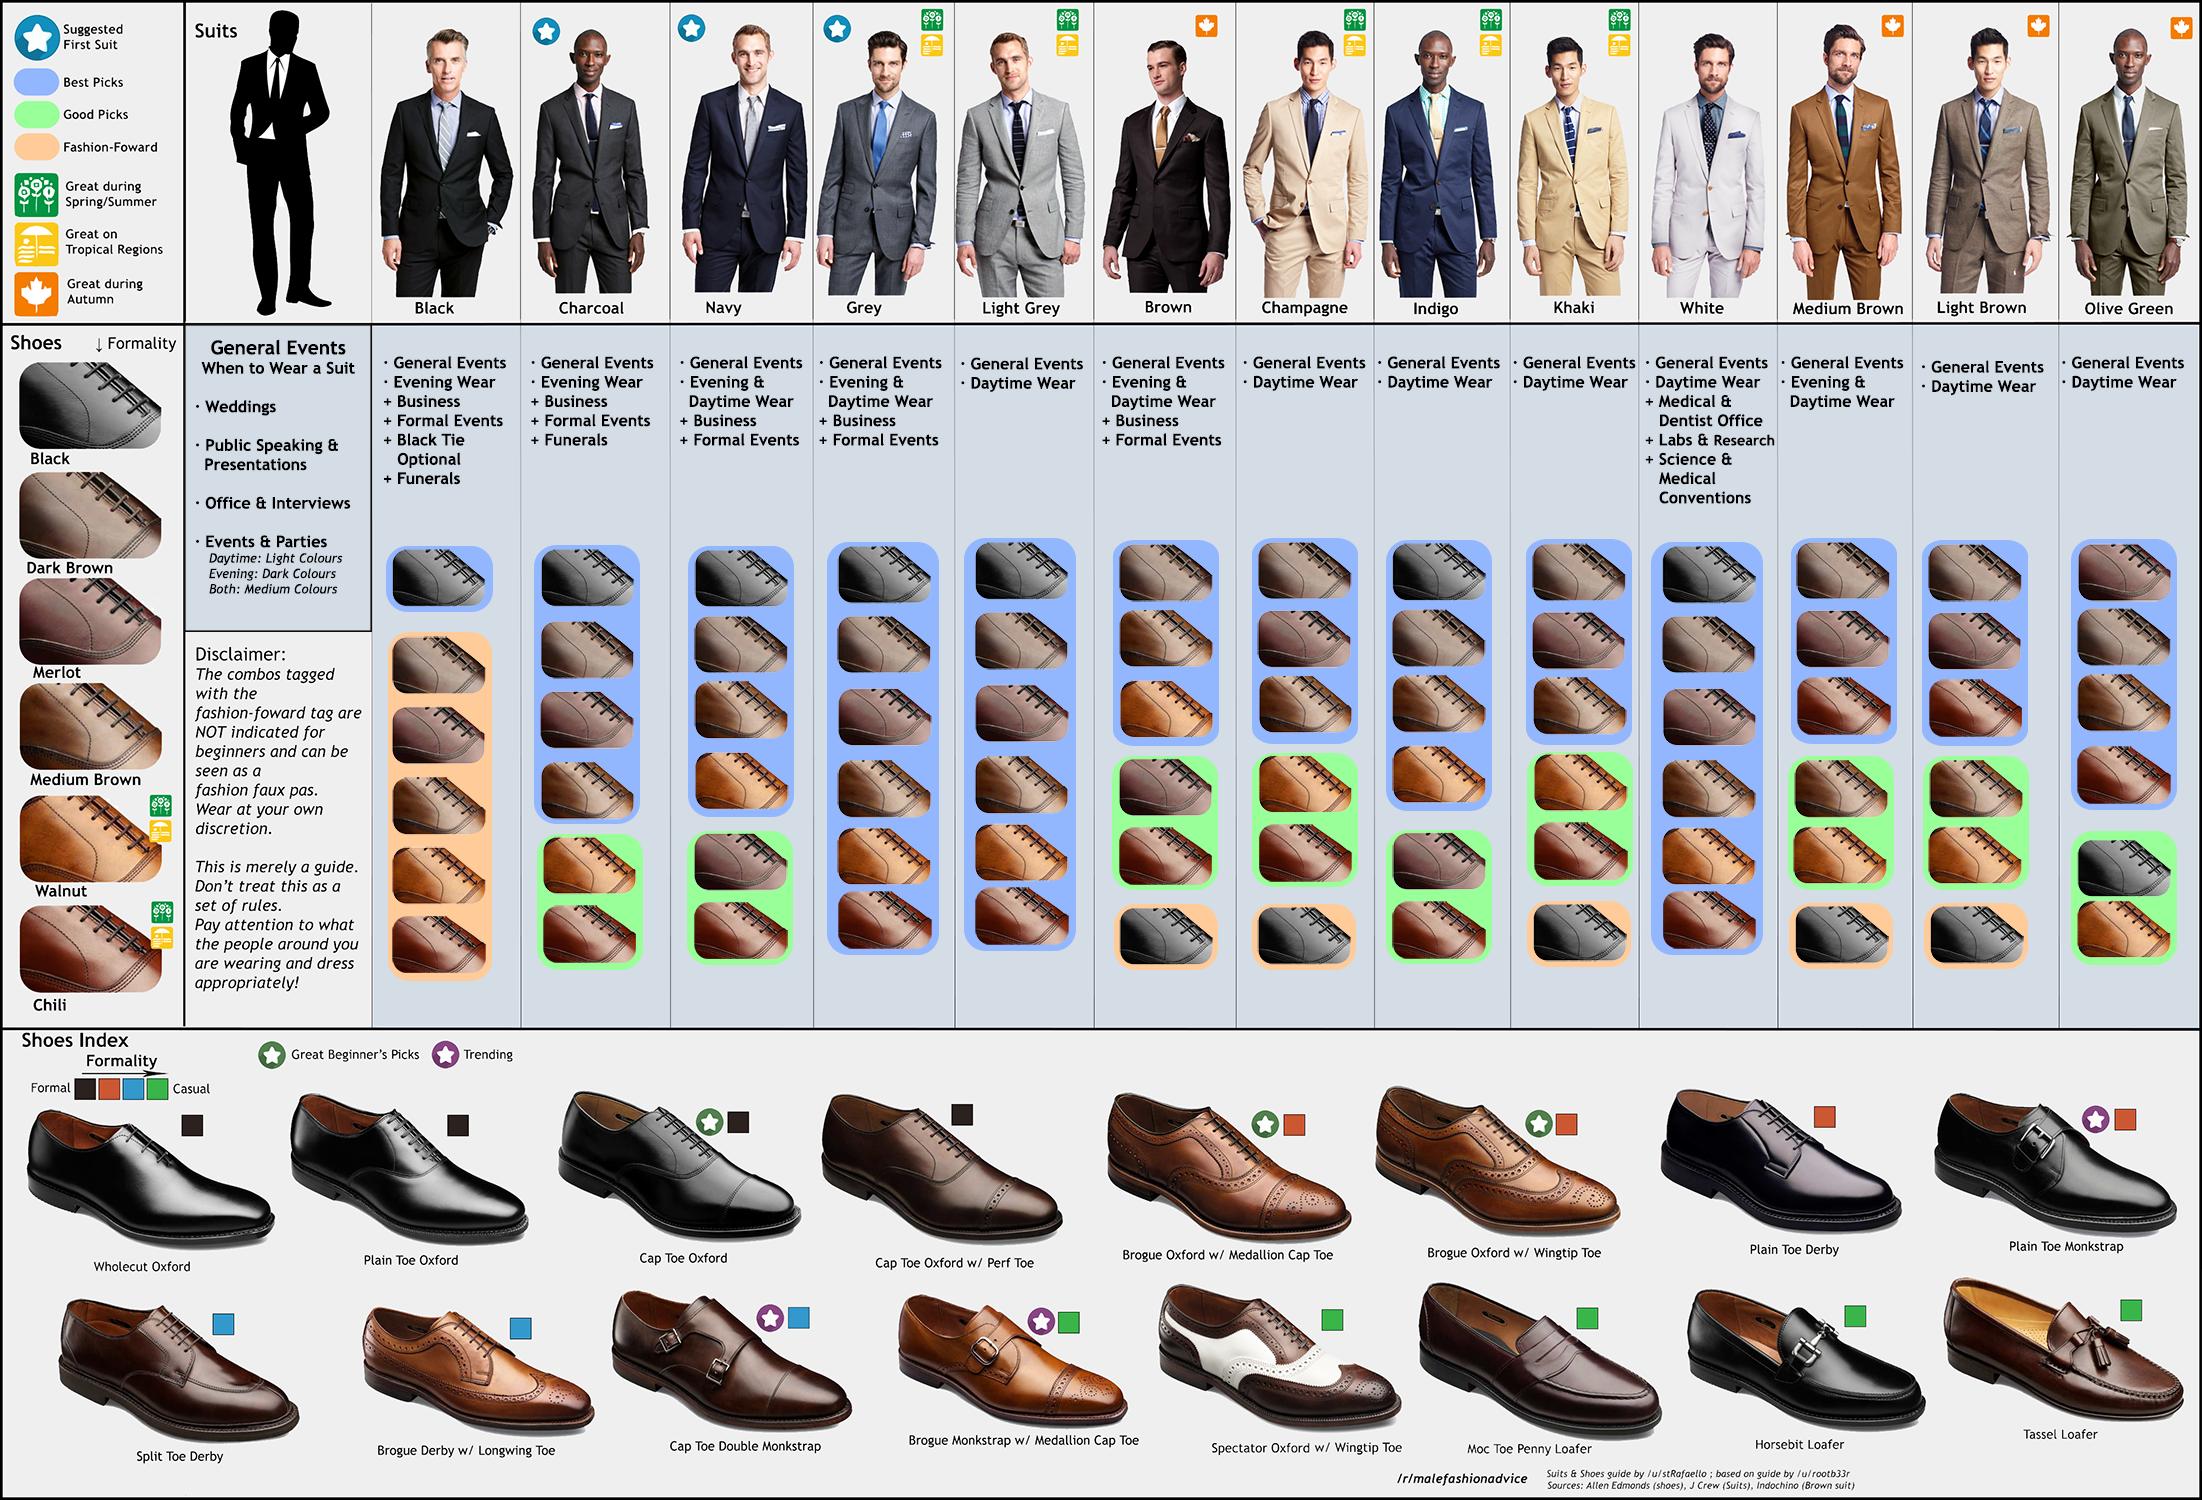 Allen Edmonds Dress Shoe Recommendations For Work Styleforum